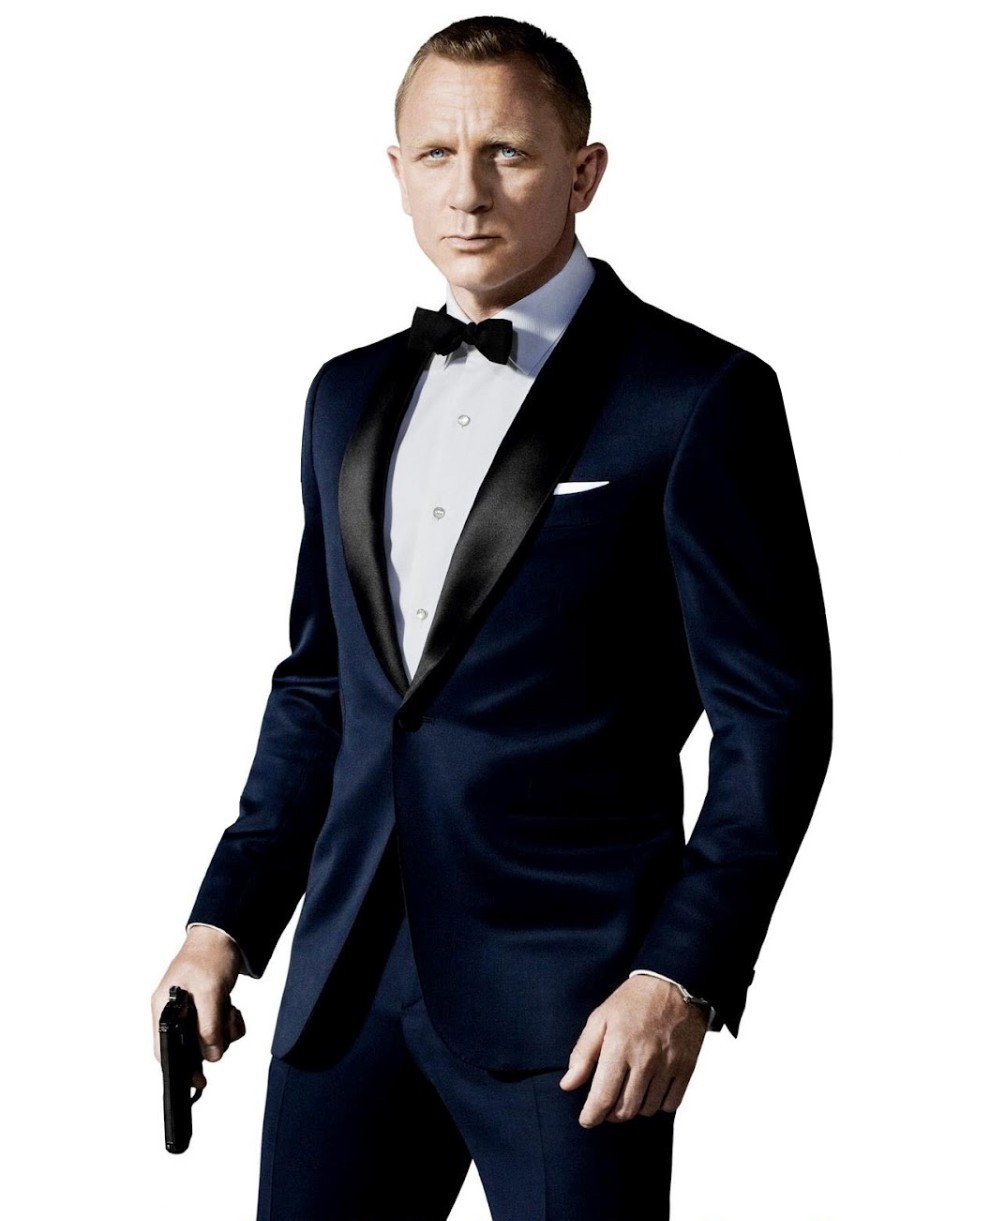 Latest Coat Pant Designs Navy Blue Shawl Lapel Wedding Suit For Men Formal Slim Fit Skinny 2 Piece Tuxedo Groom Blazer Masculino